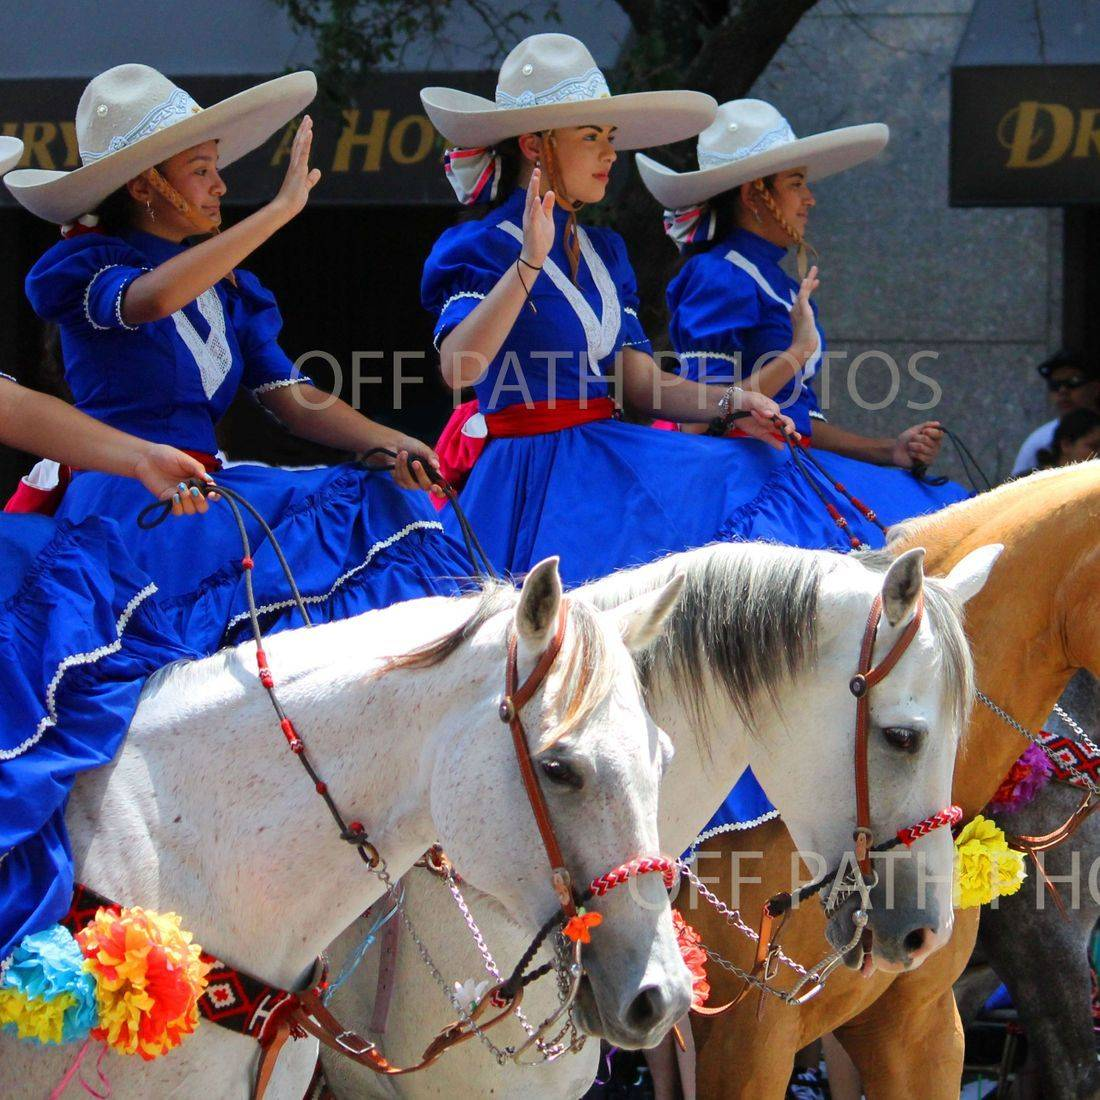 photography, fiesta, parade, horses, riders, people, San Antonio, Texas, fun